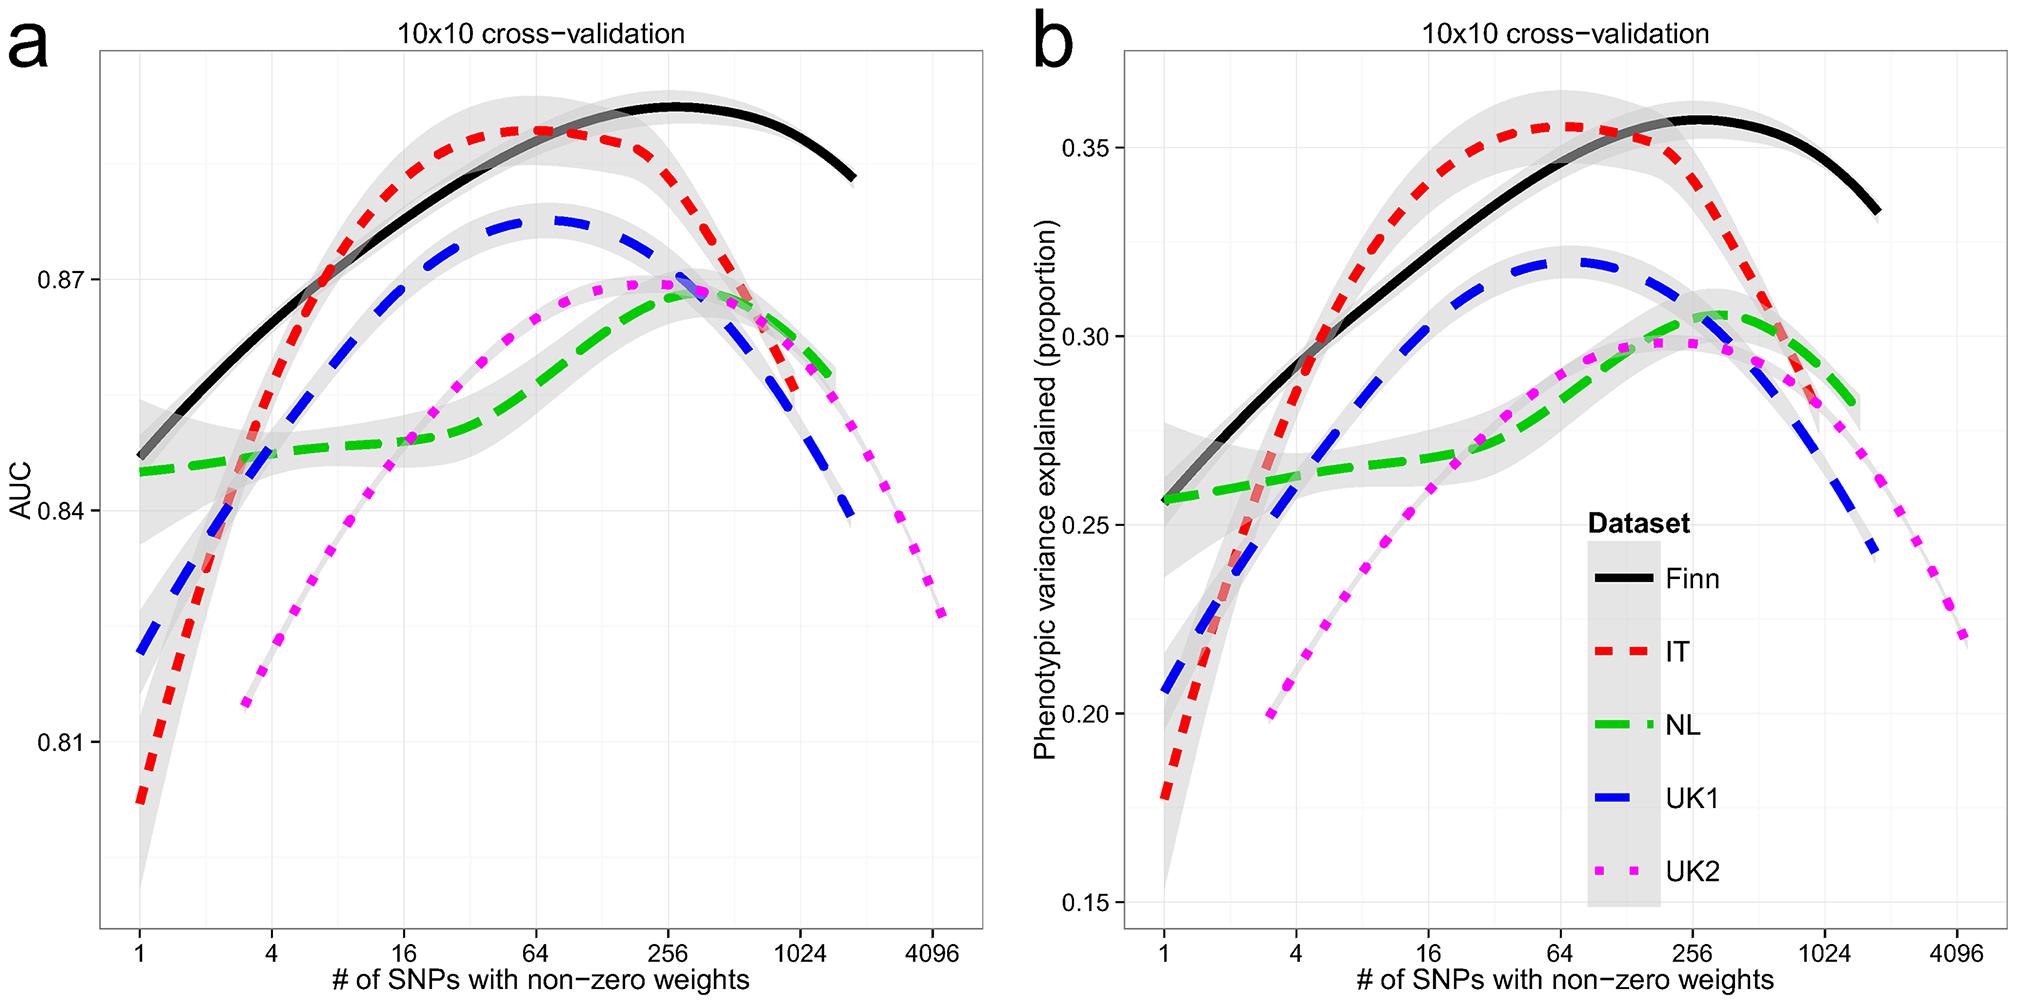 Building genomic models predictive of celiac disease.